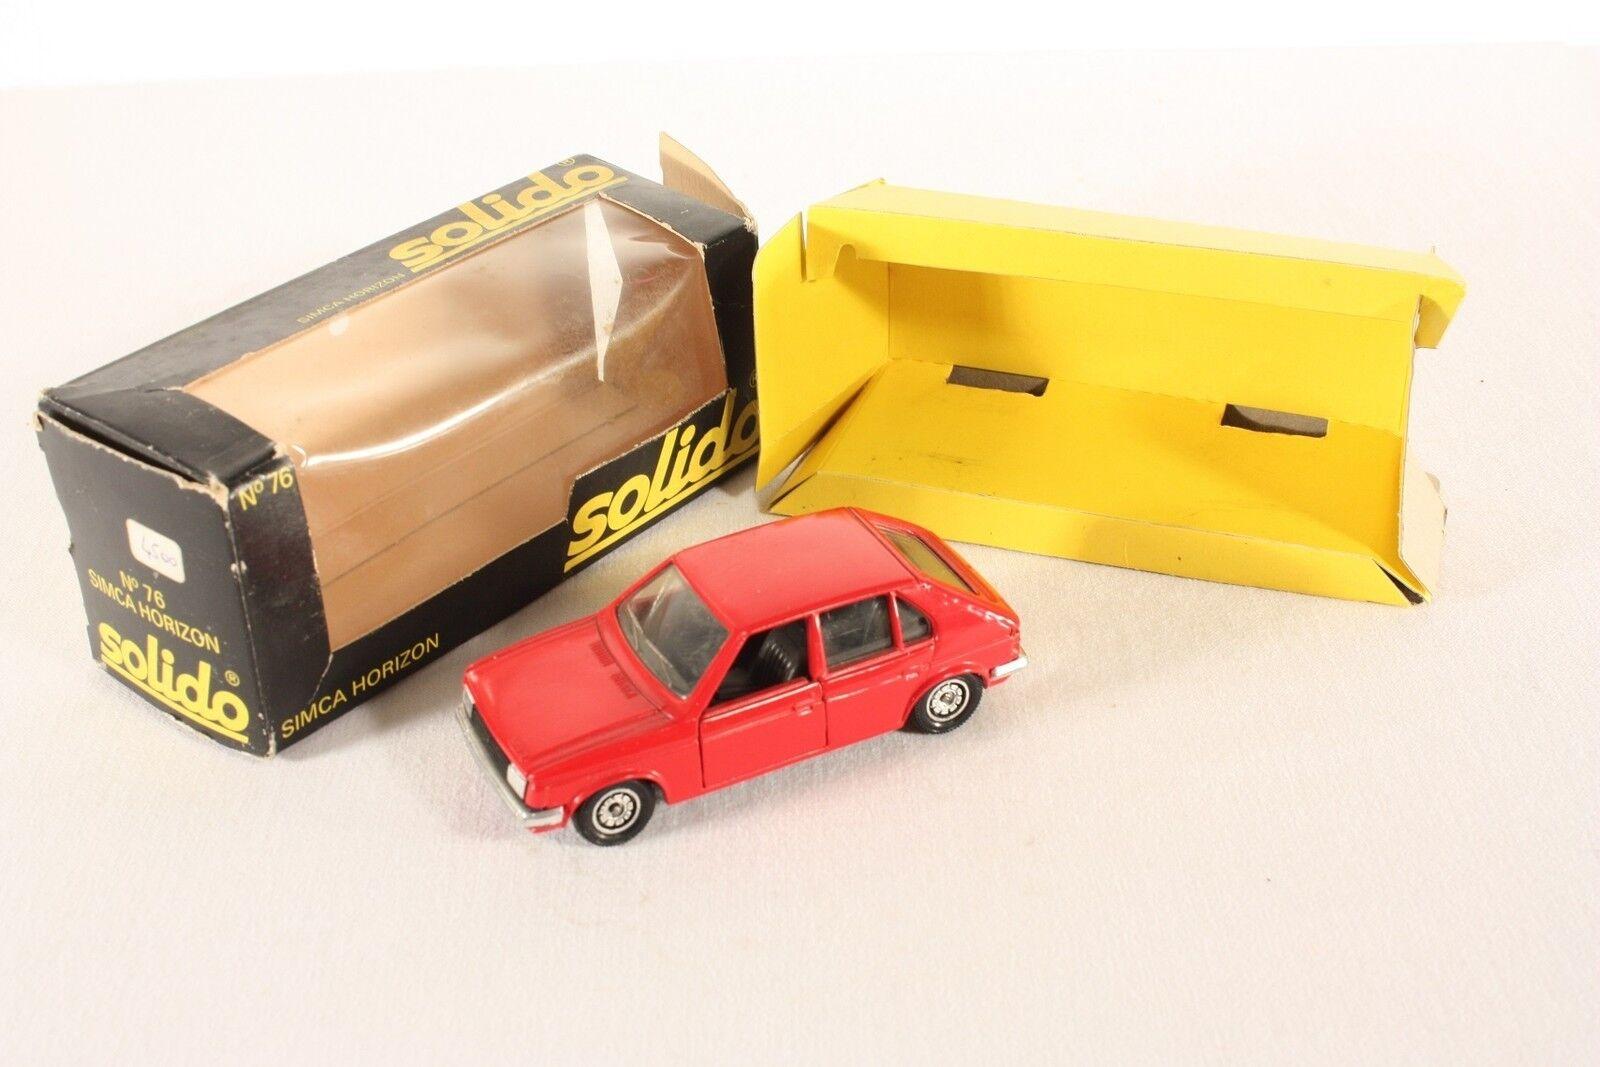 Solido 76, Simca Horizon, Mint in Box                  ab678